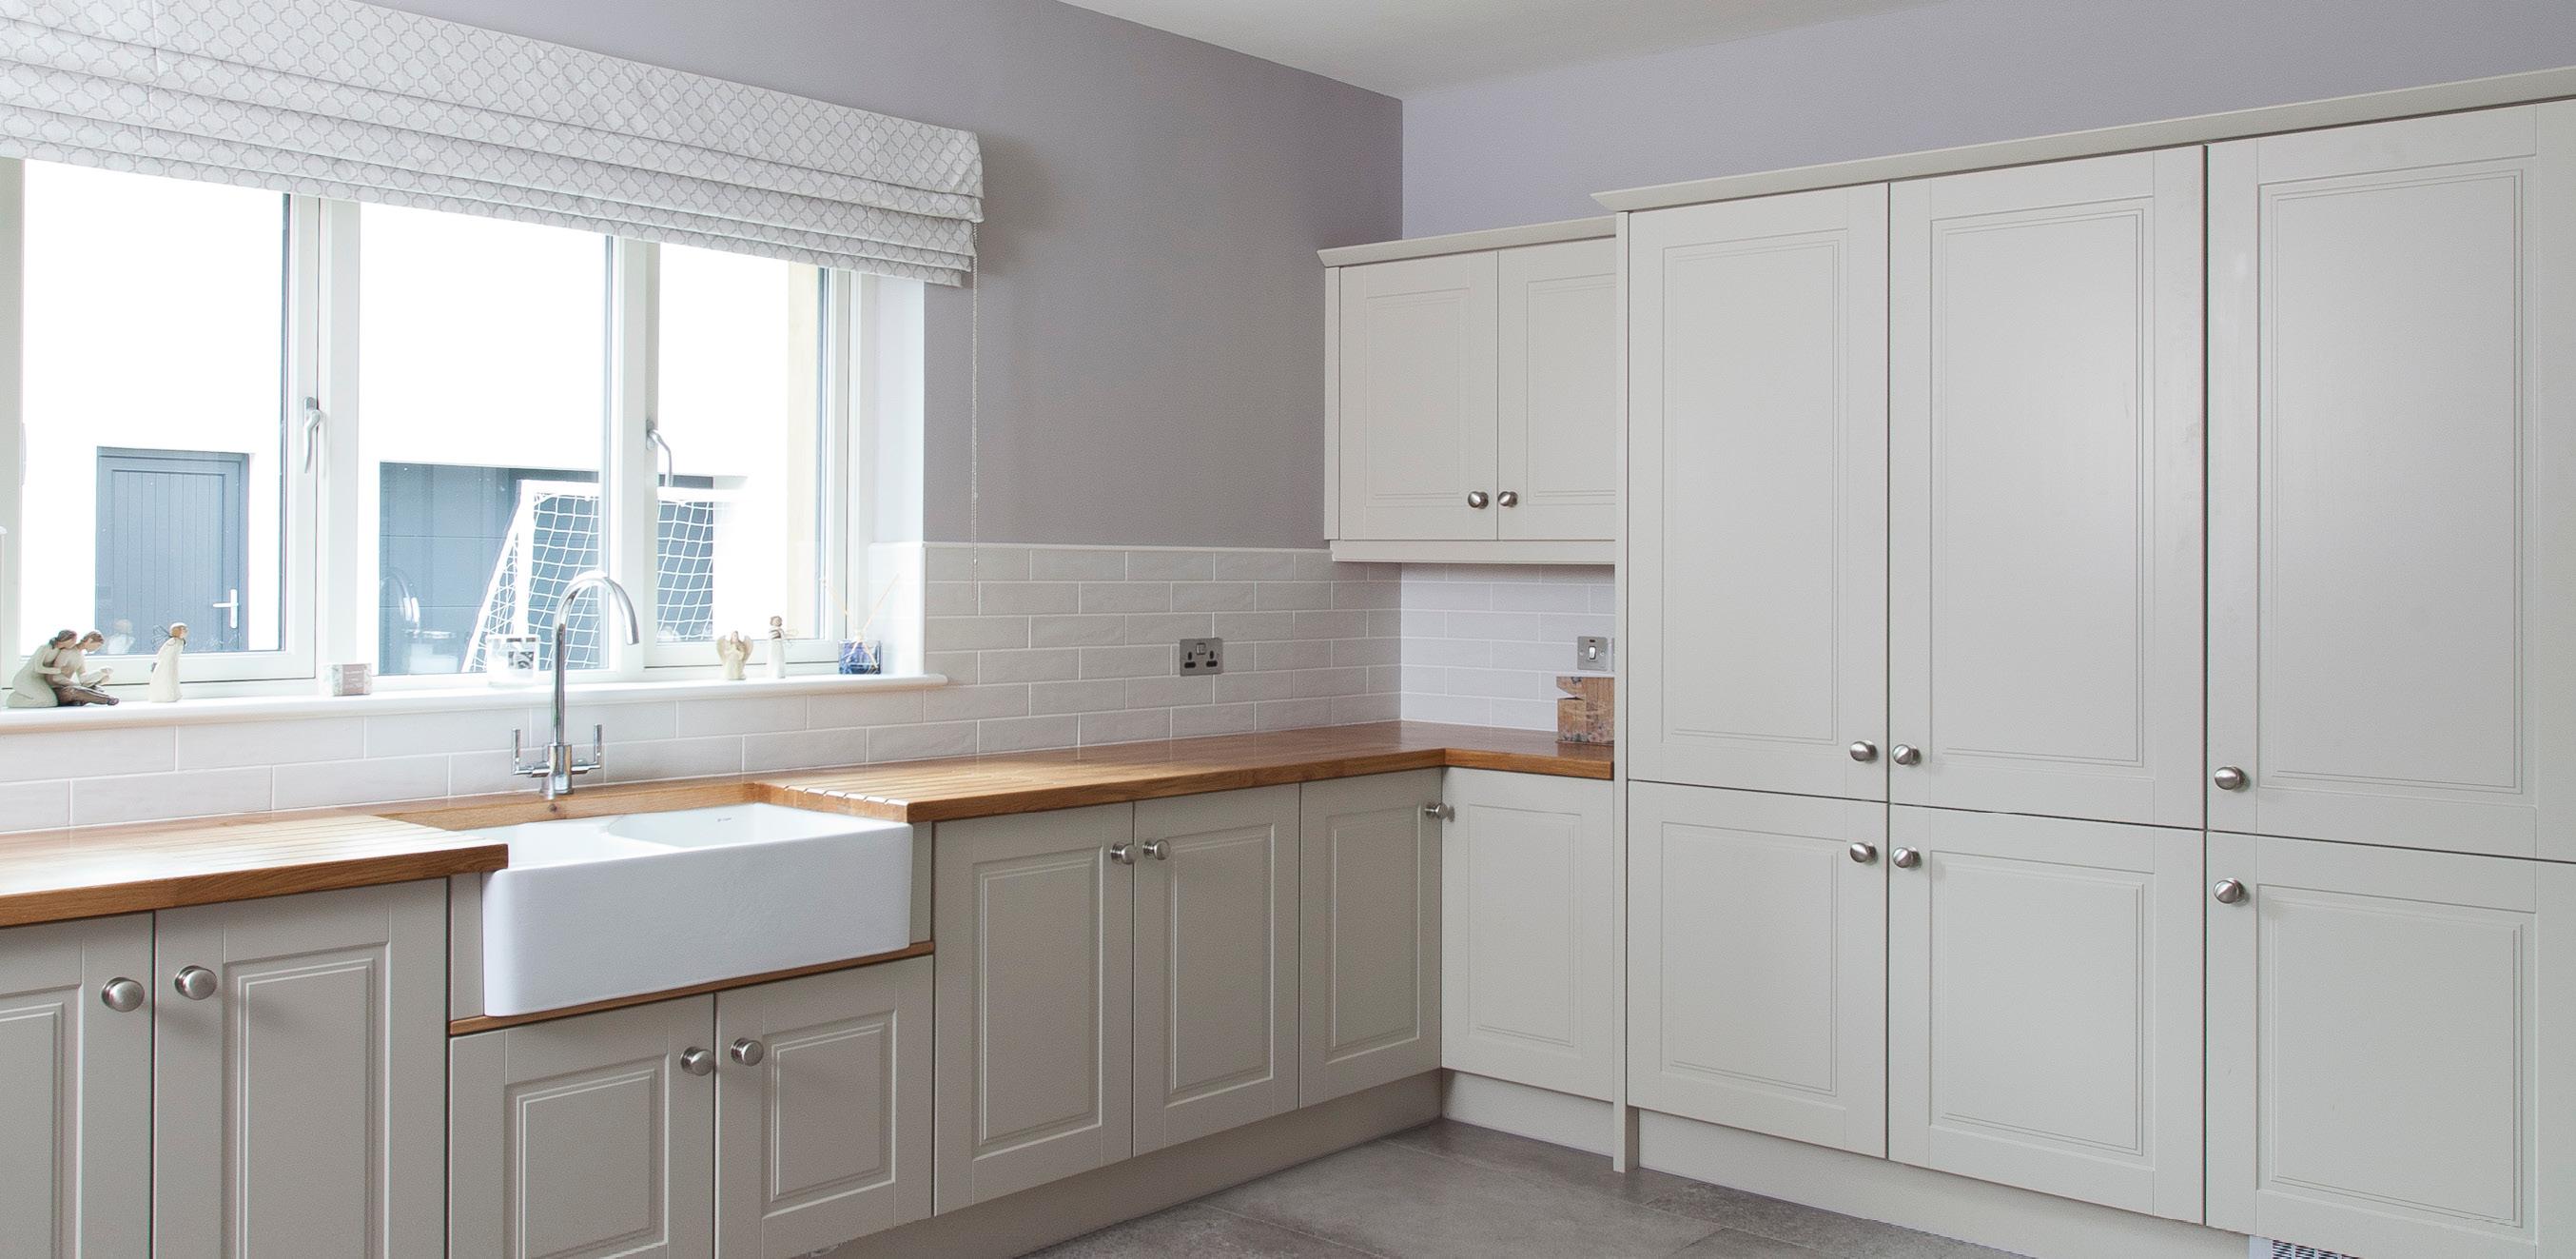 Modern Classic Kitchen, Co Fermanagh  7